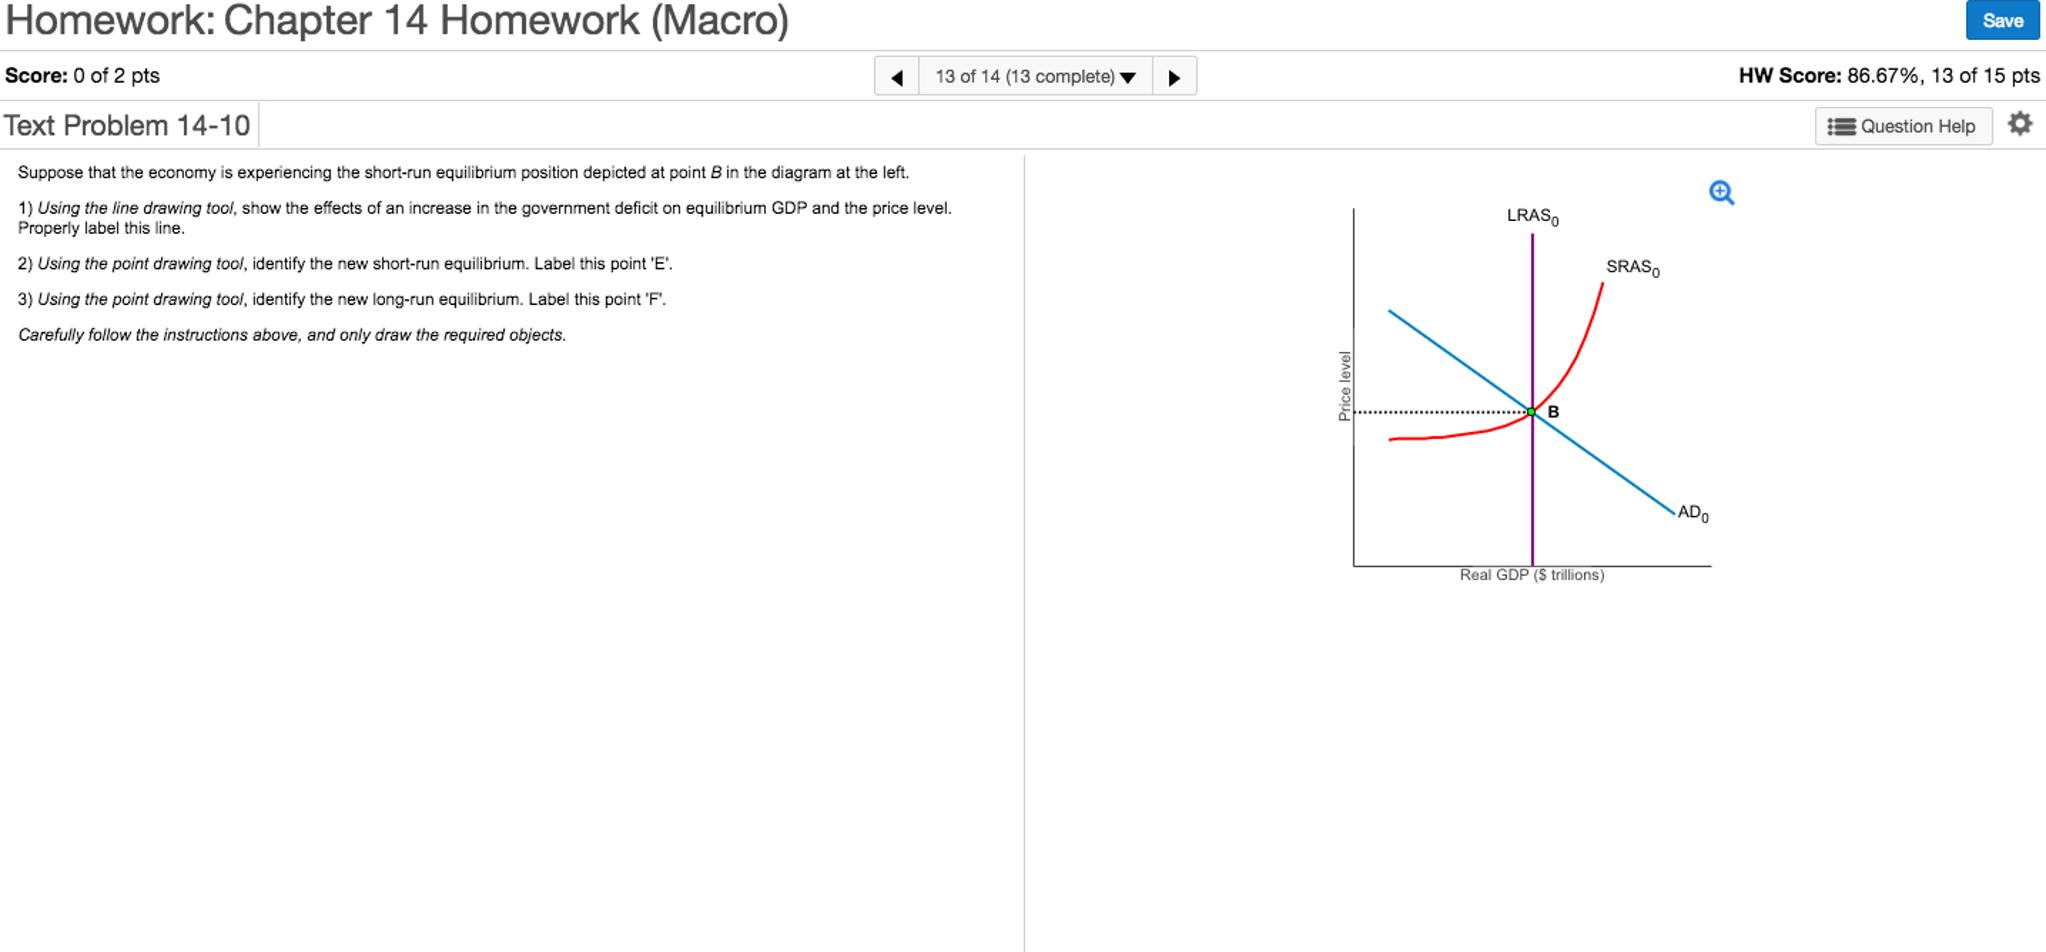 how to write a resume after graduating graduate school essay essay n economy inverse variation homework help essays on economic liberalisation and reforms diamond geo engineering